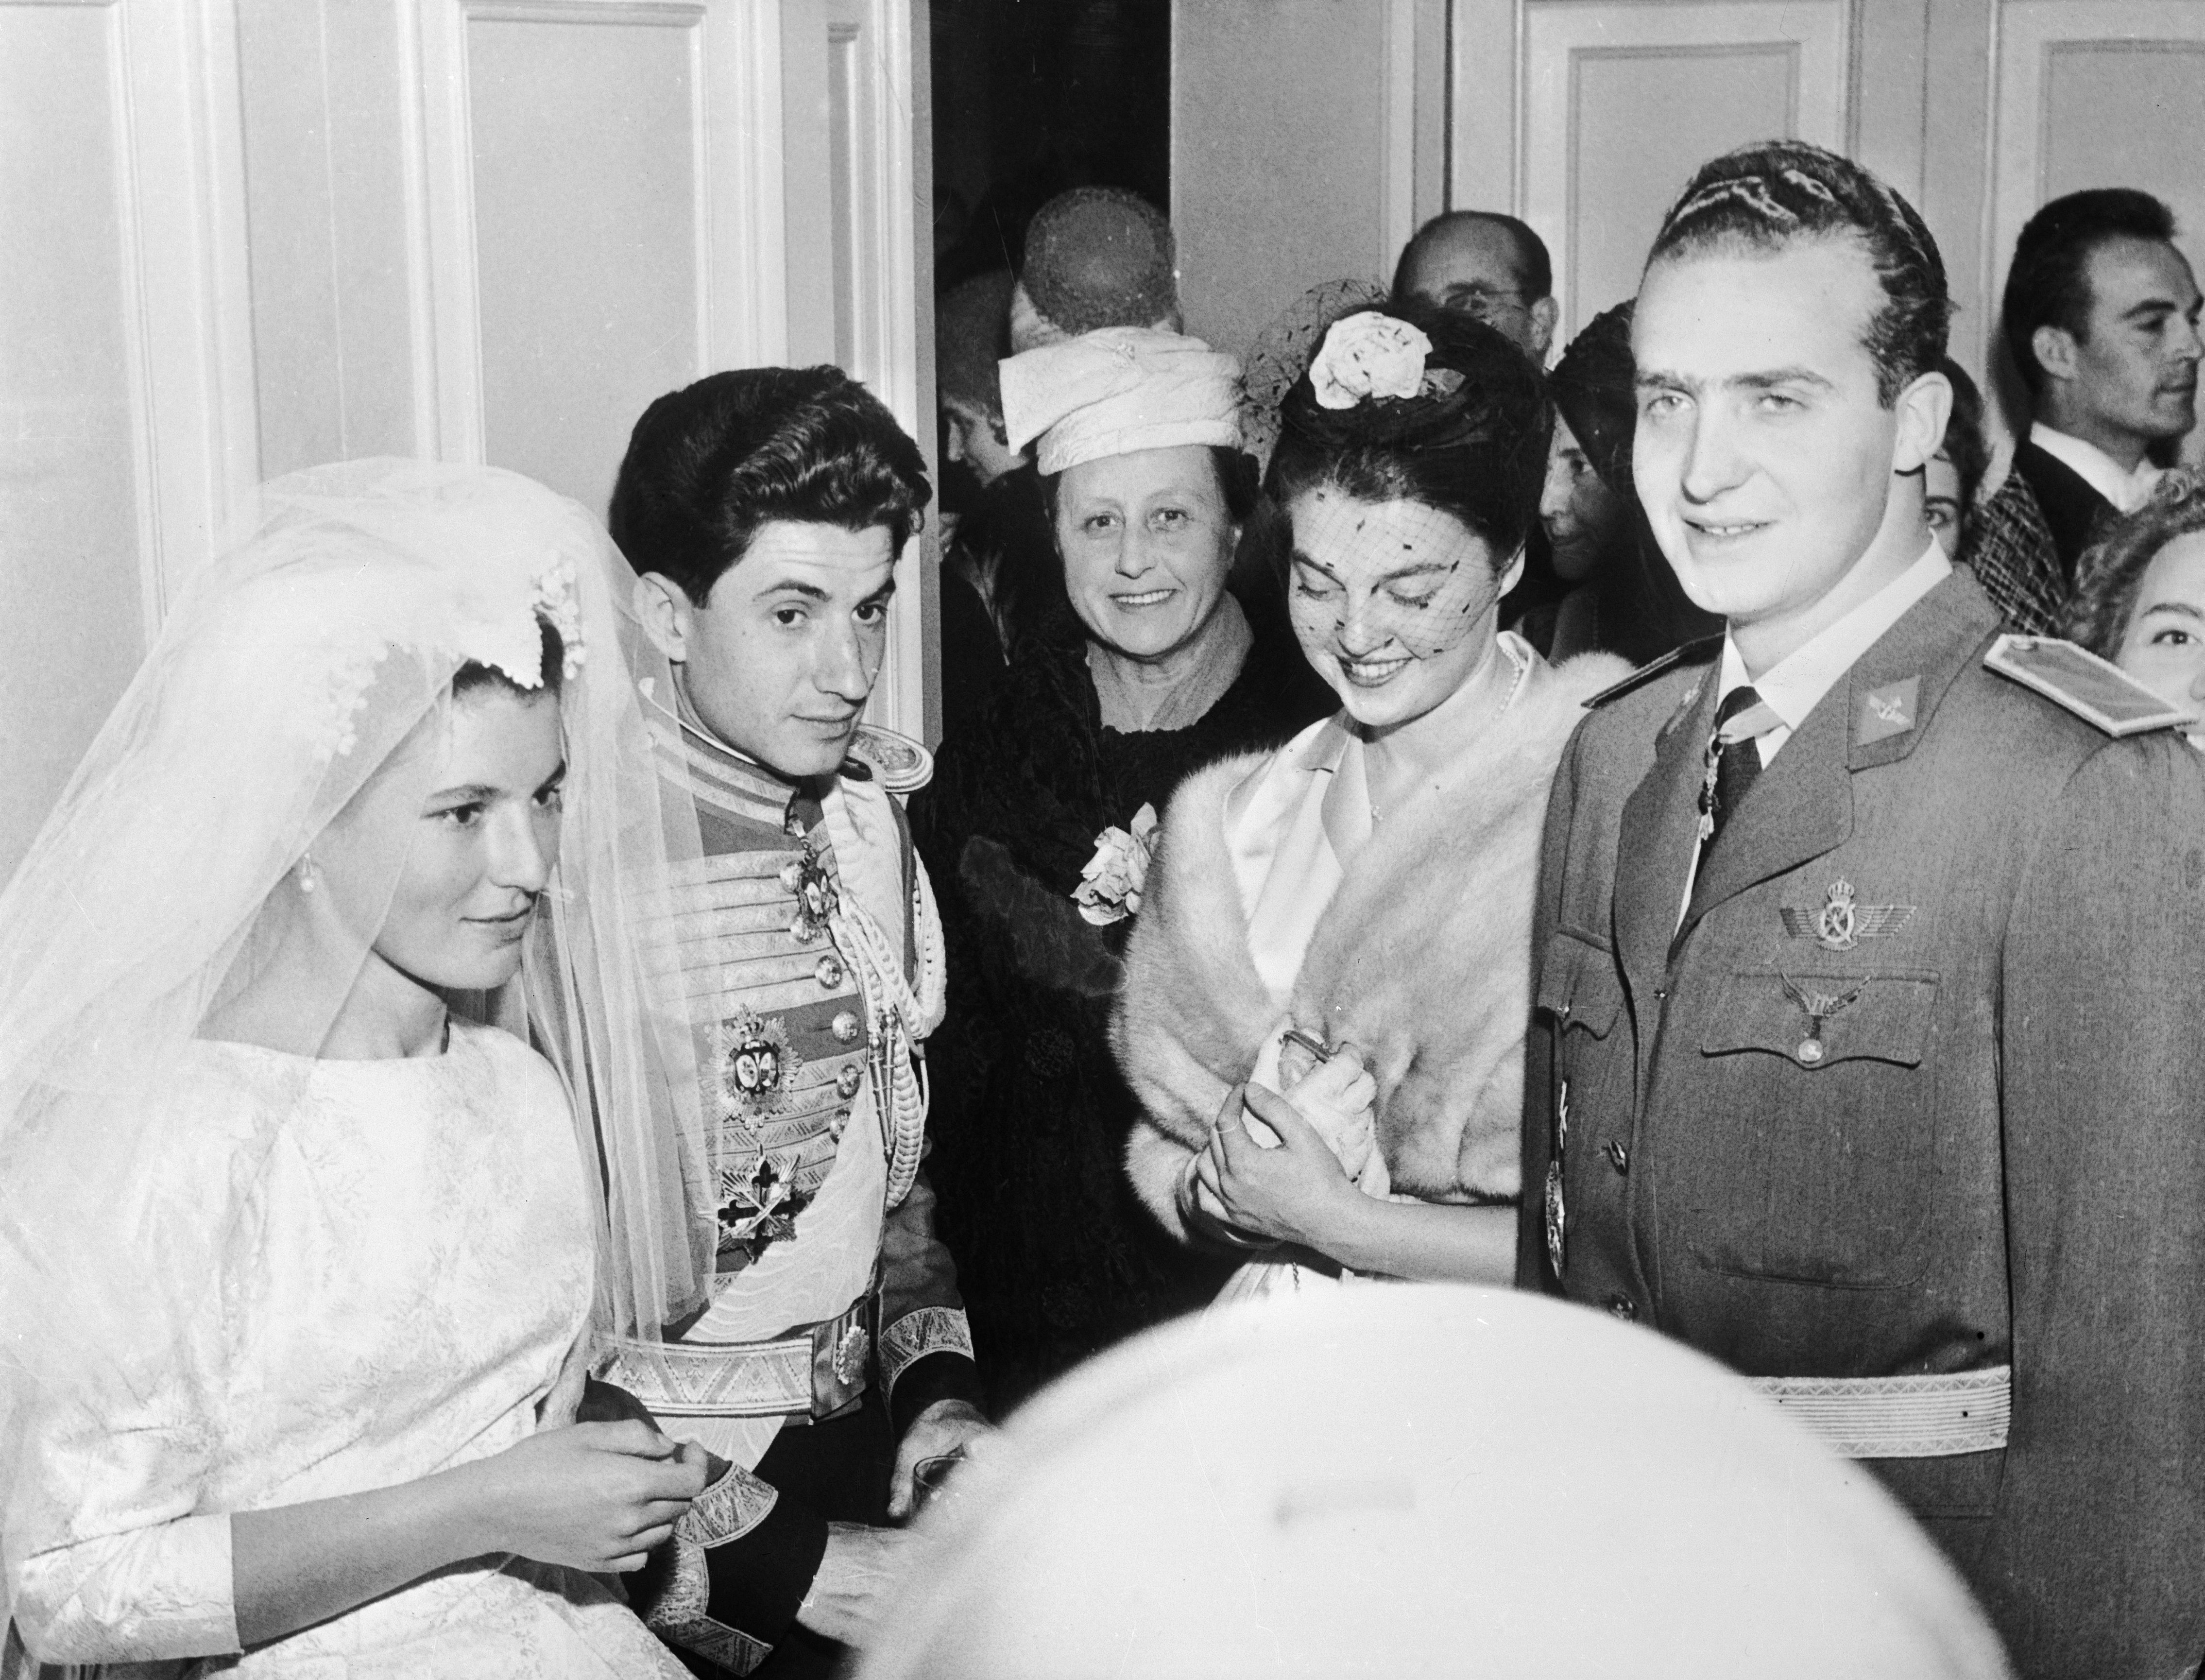 SPAIN - MARCH 19:  19Th Of March. 1961. Madrid. Basilica Atocha. Wedding Of Princess Maria Teresa Of Bourbon Parma To The Marquis Of Laula  (Photo by Keystone-France/Gamma-Keystone via Getty Images)